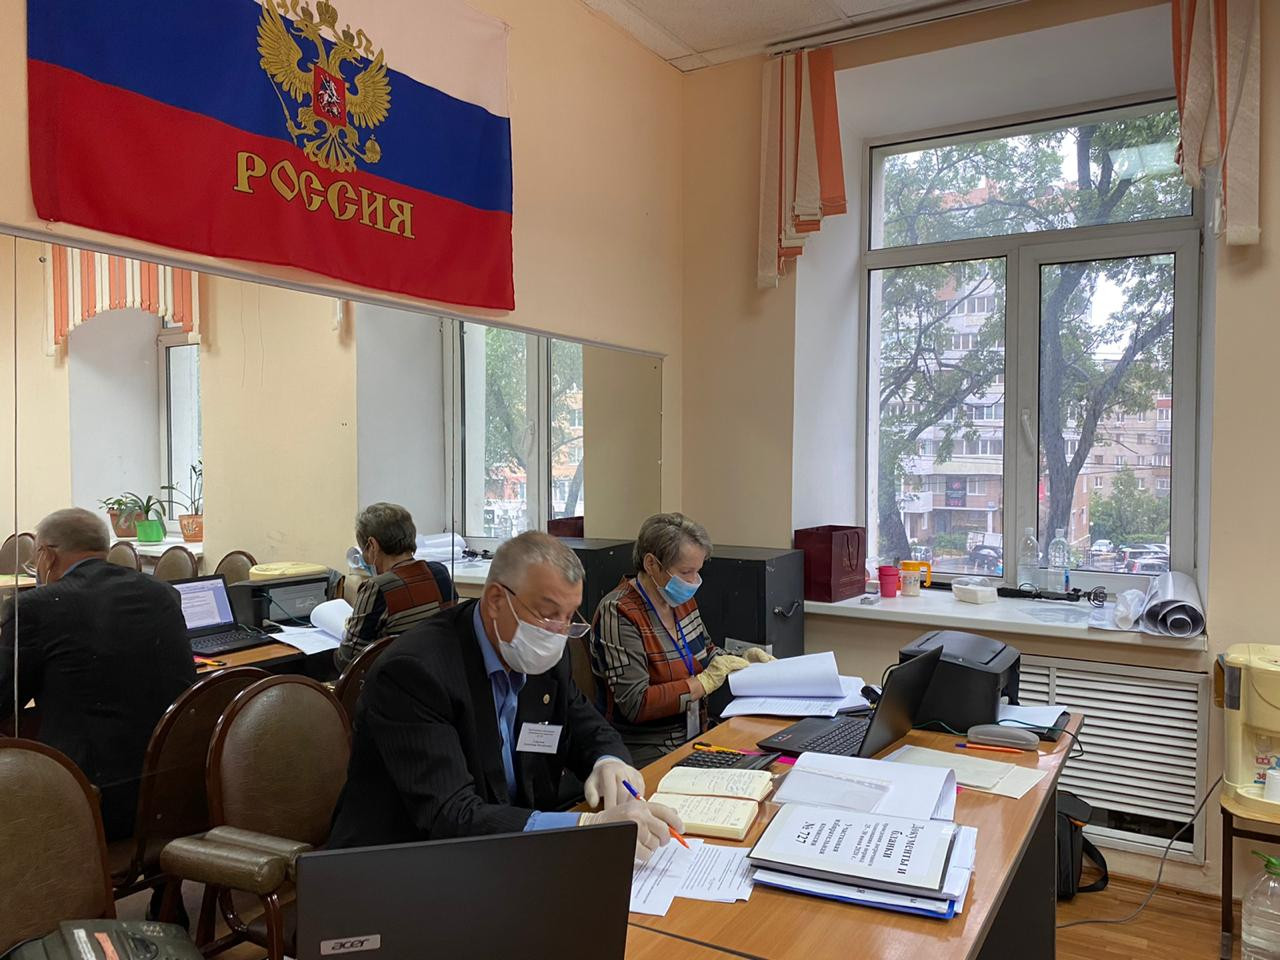 Четыре партии направят наблюдателей на голосование по Конституции в Приморье